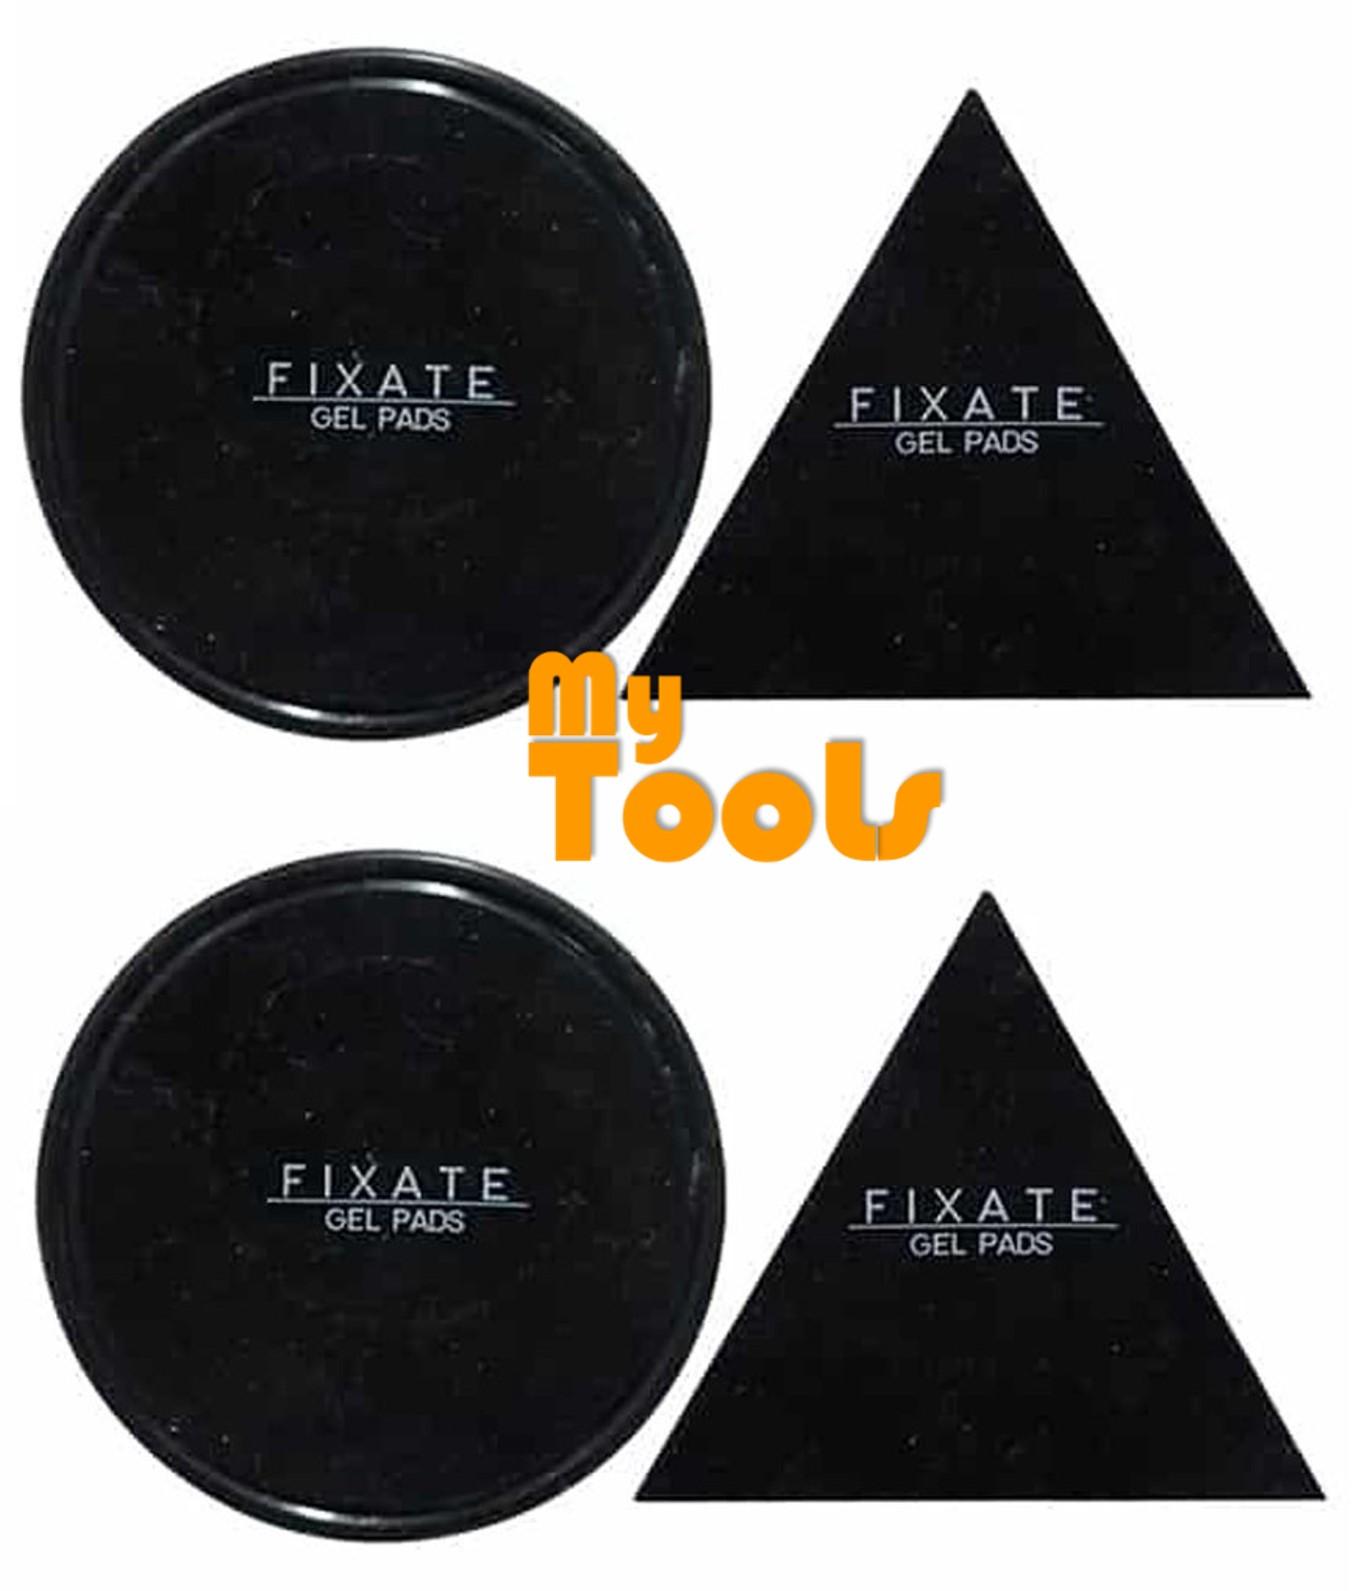 [2 Set] FIXATE GEL PAD Anti-slip Cells Pads Durable Washable 2pcs triangle + 2pcs circle